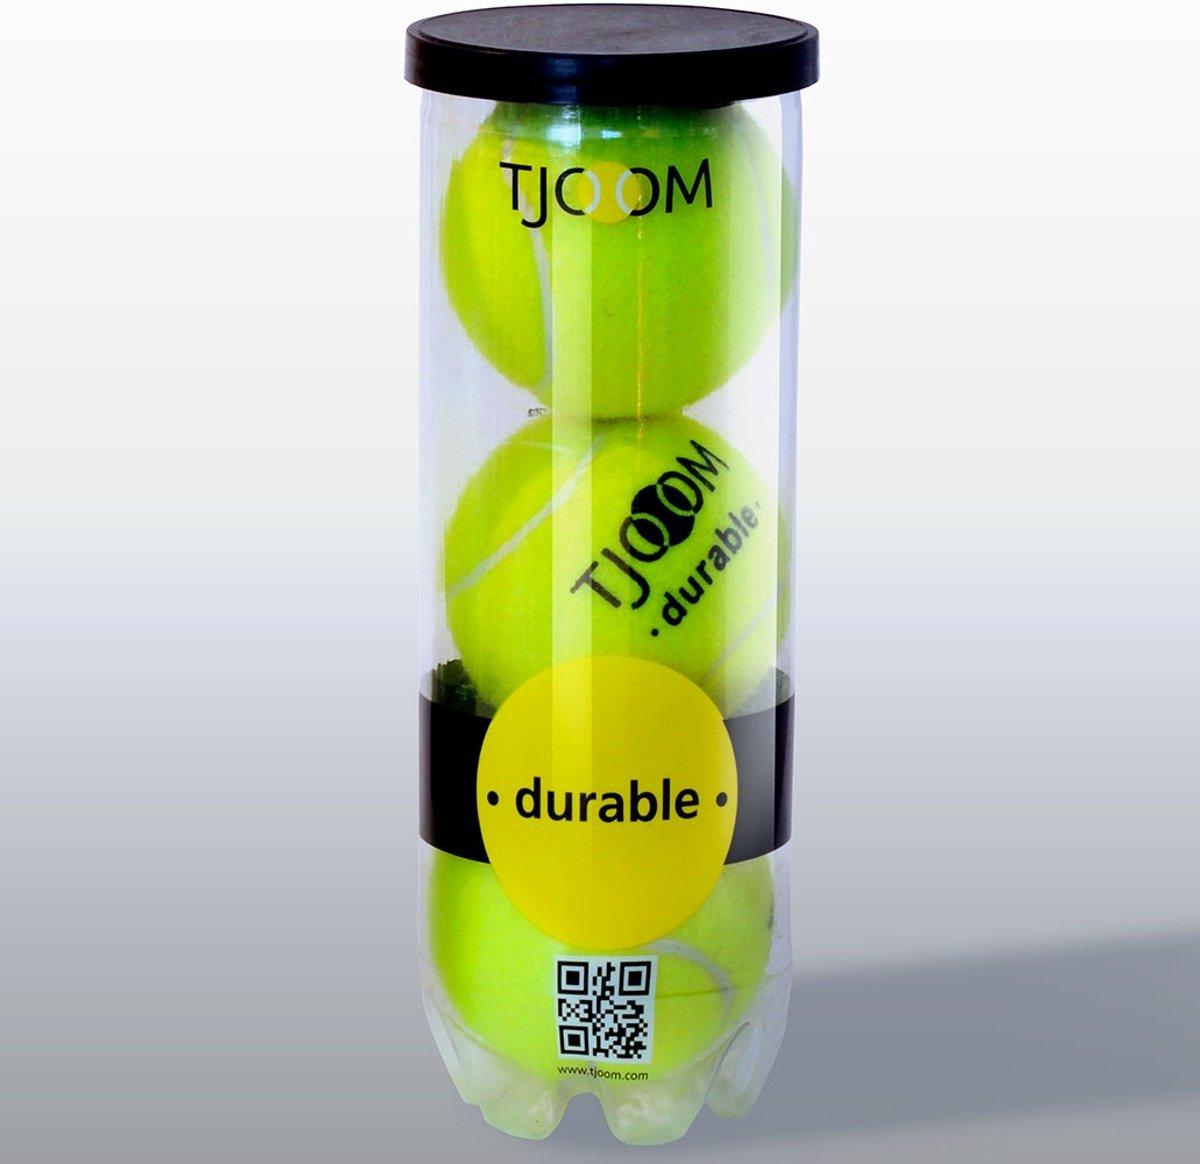 Tjoom durable Sixpack kopen